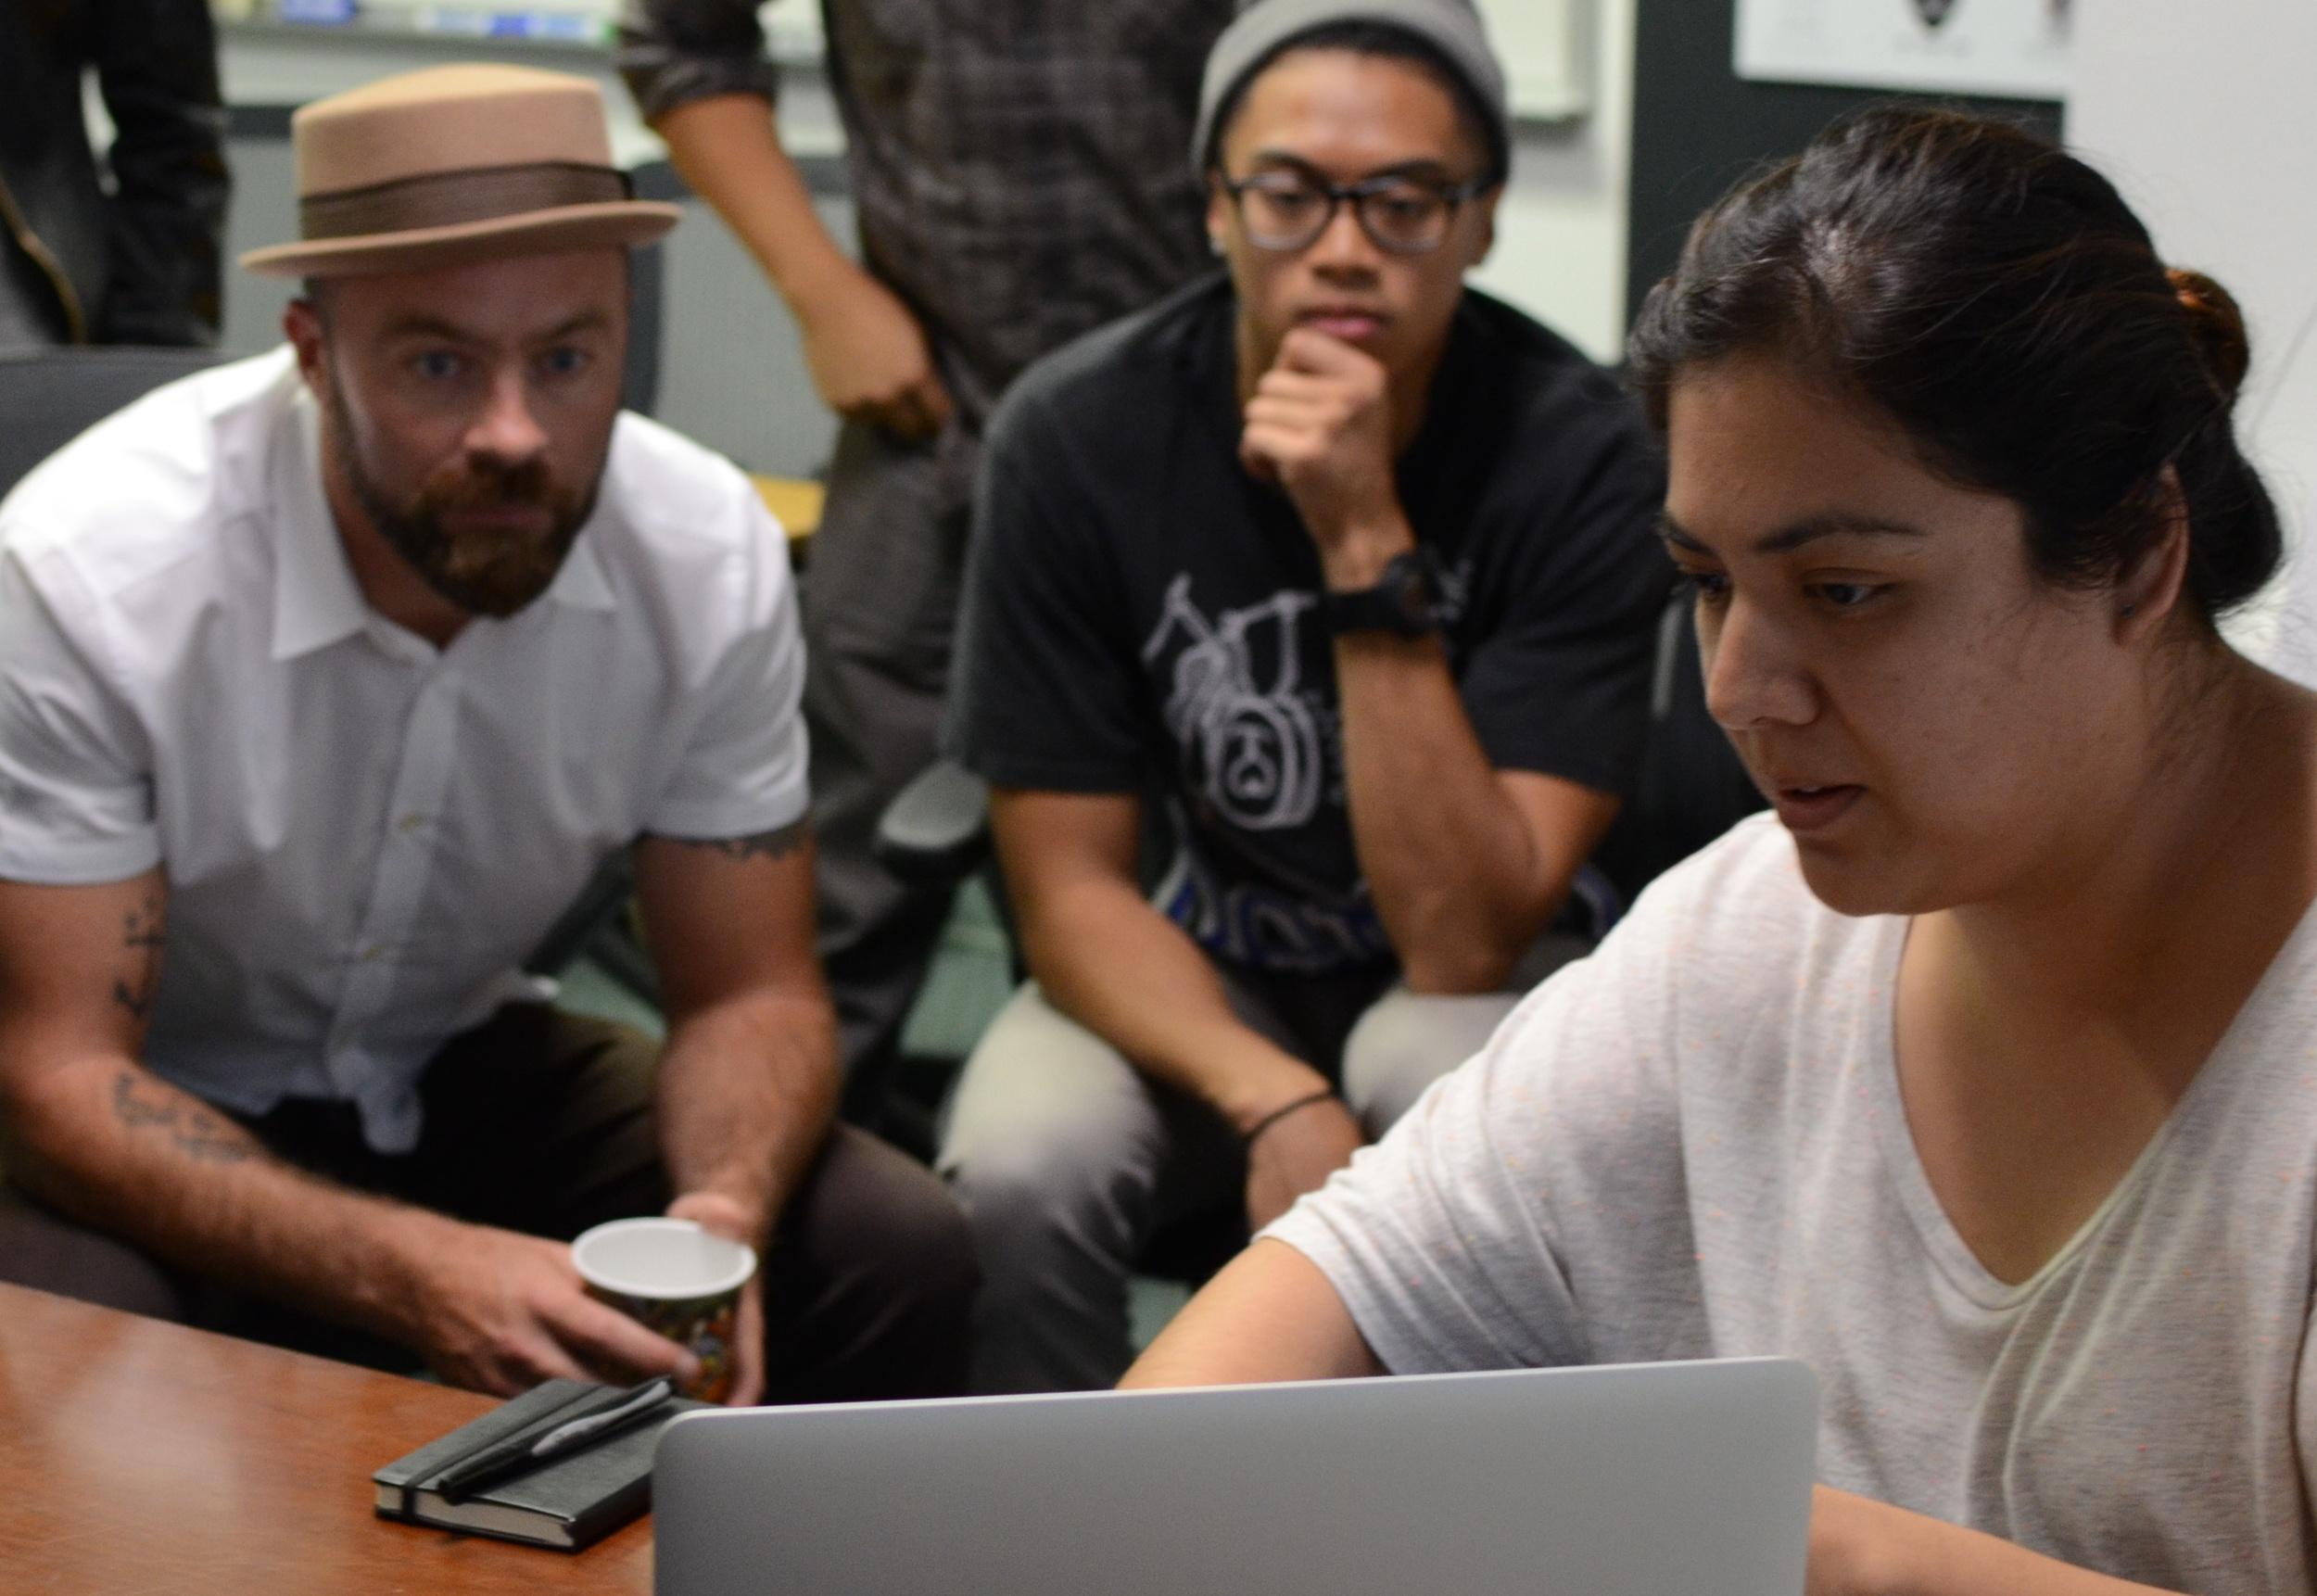 Paul (left) reviewing web design work